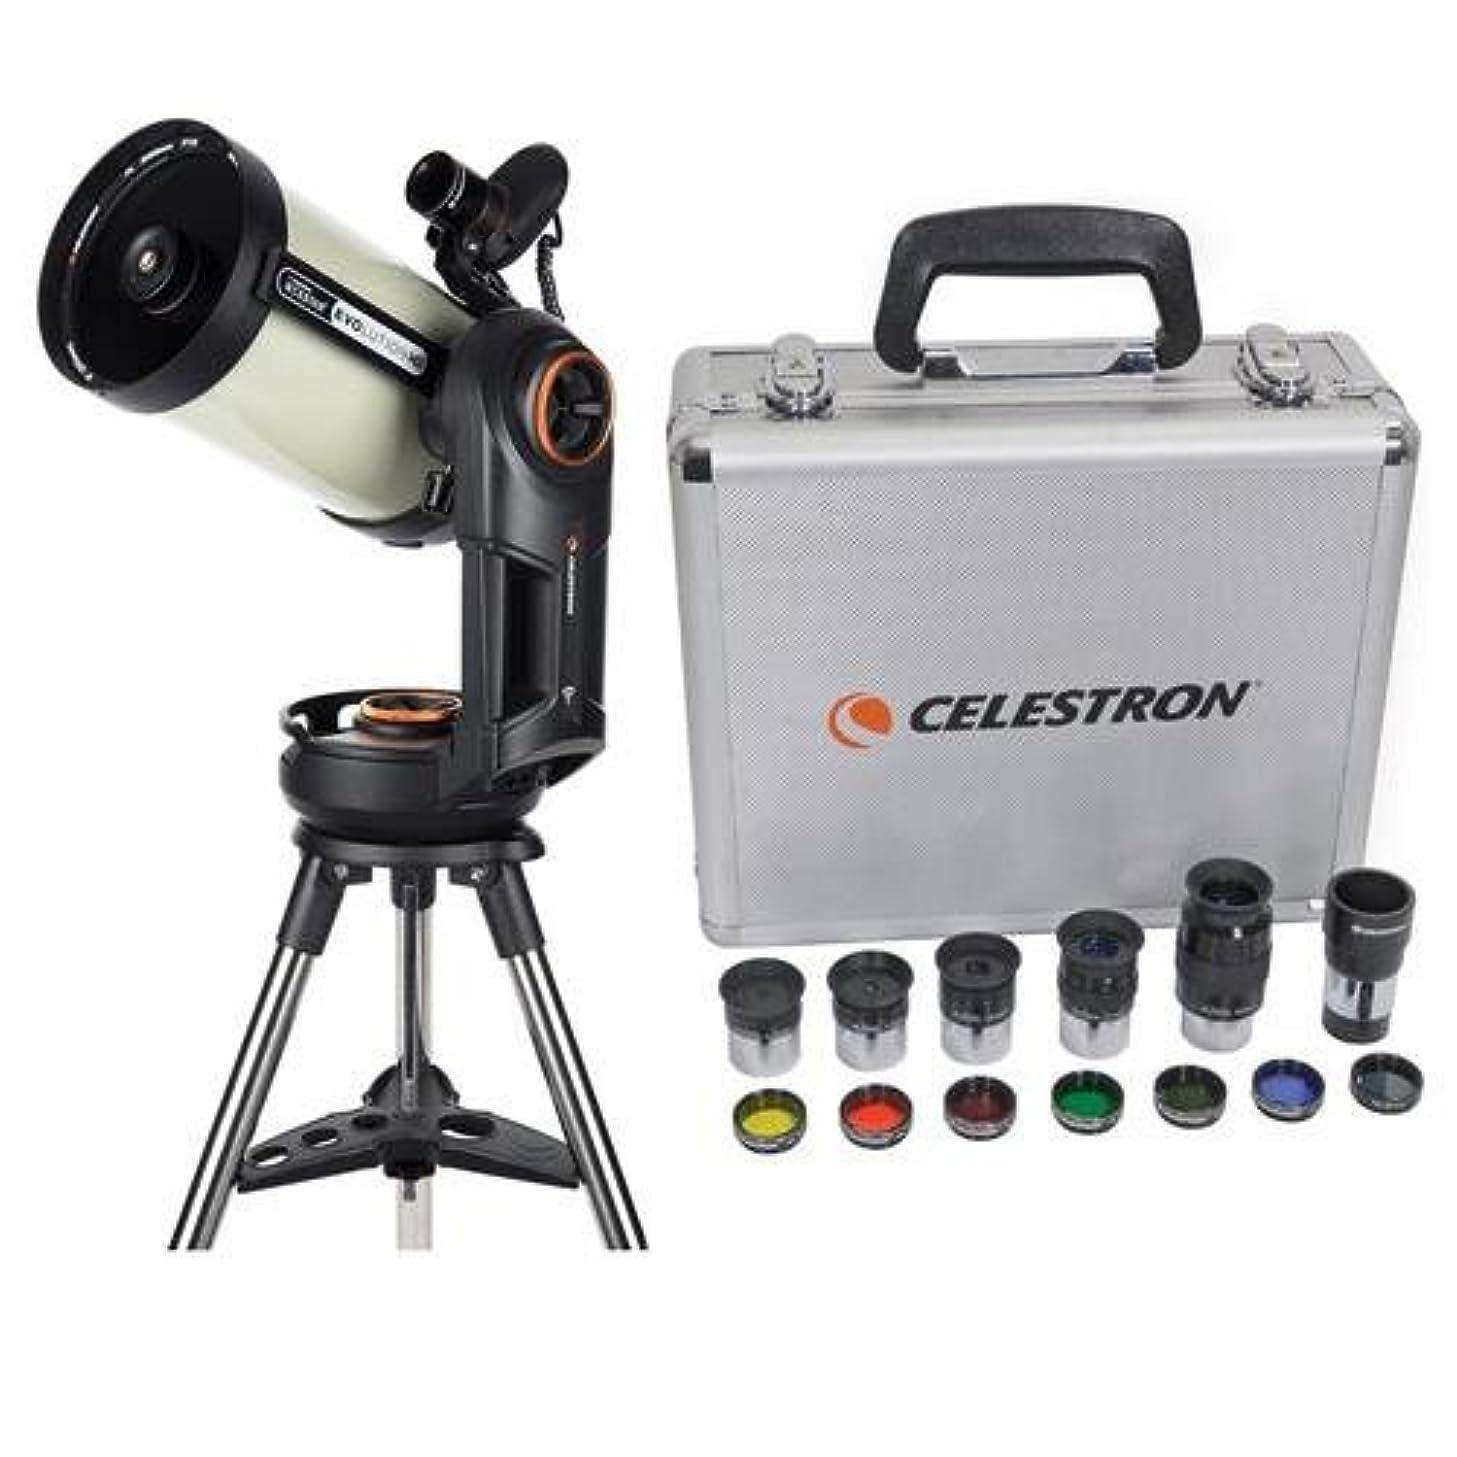 Celestron NexStar Evolution 8 EdgeHD Telescope + Celestron Eyepiece Accessory Kit